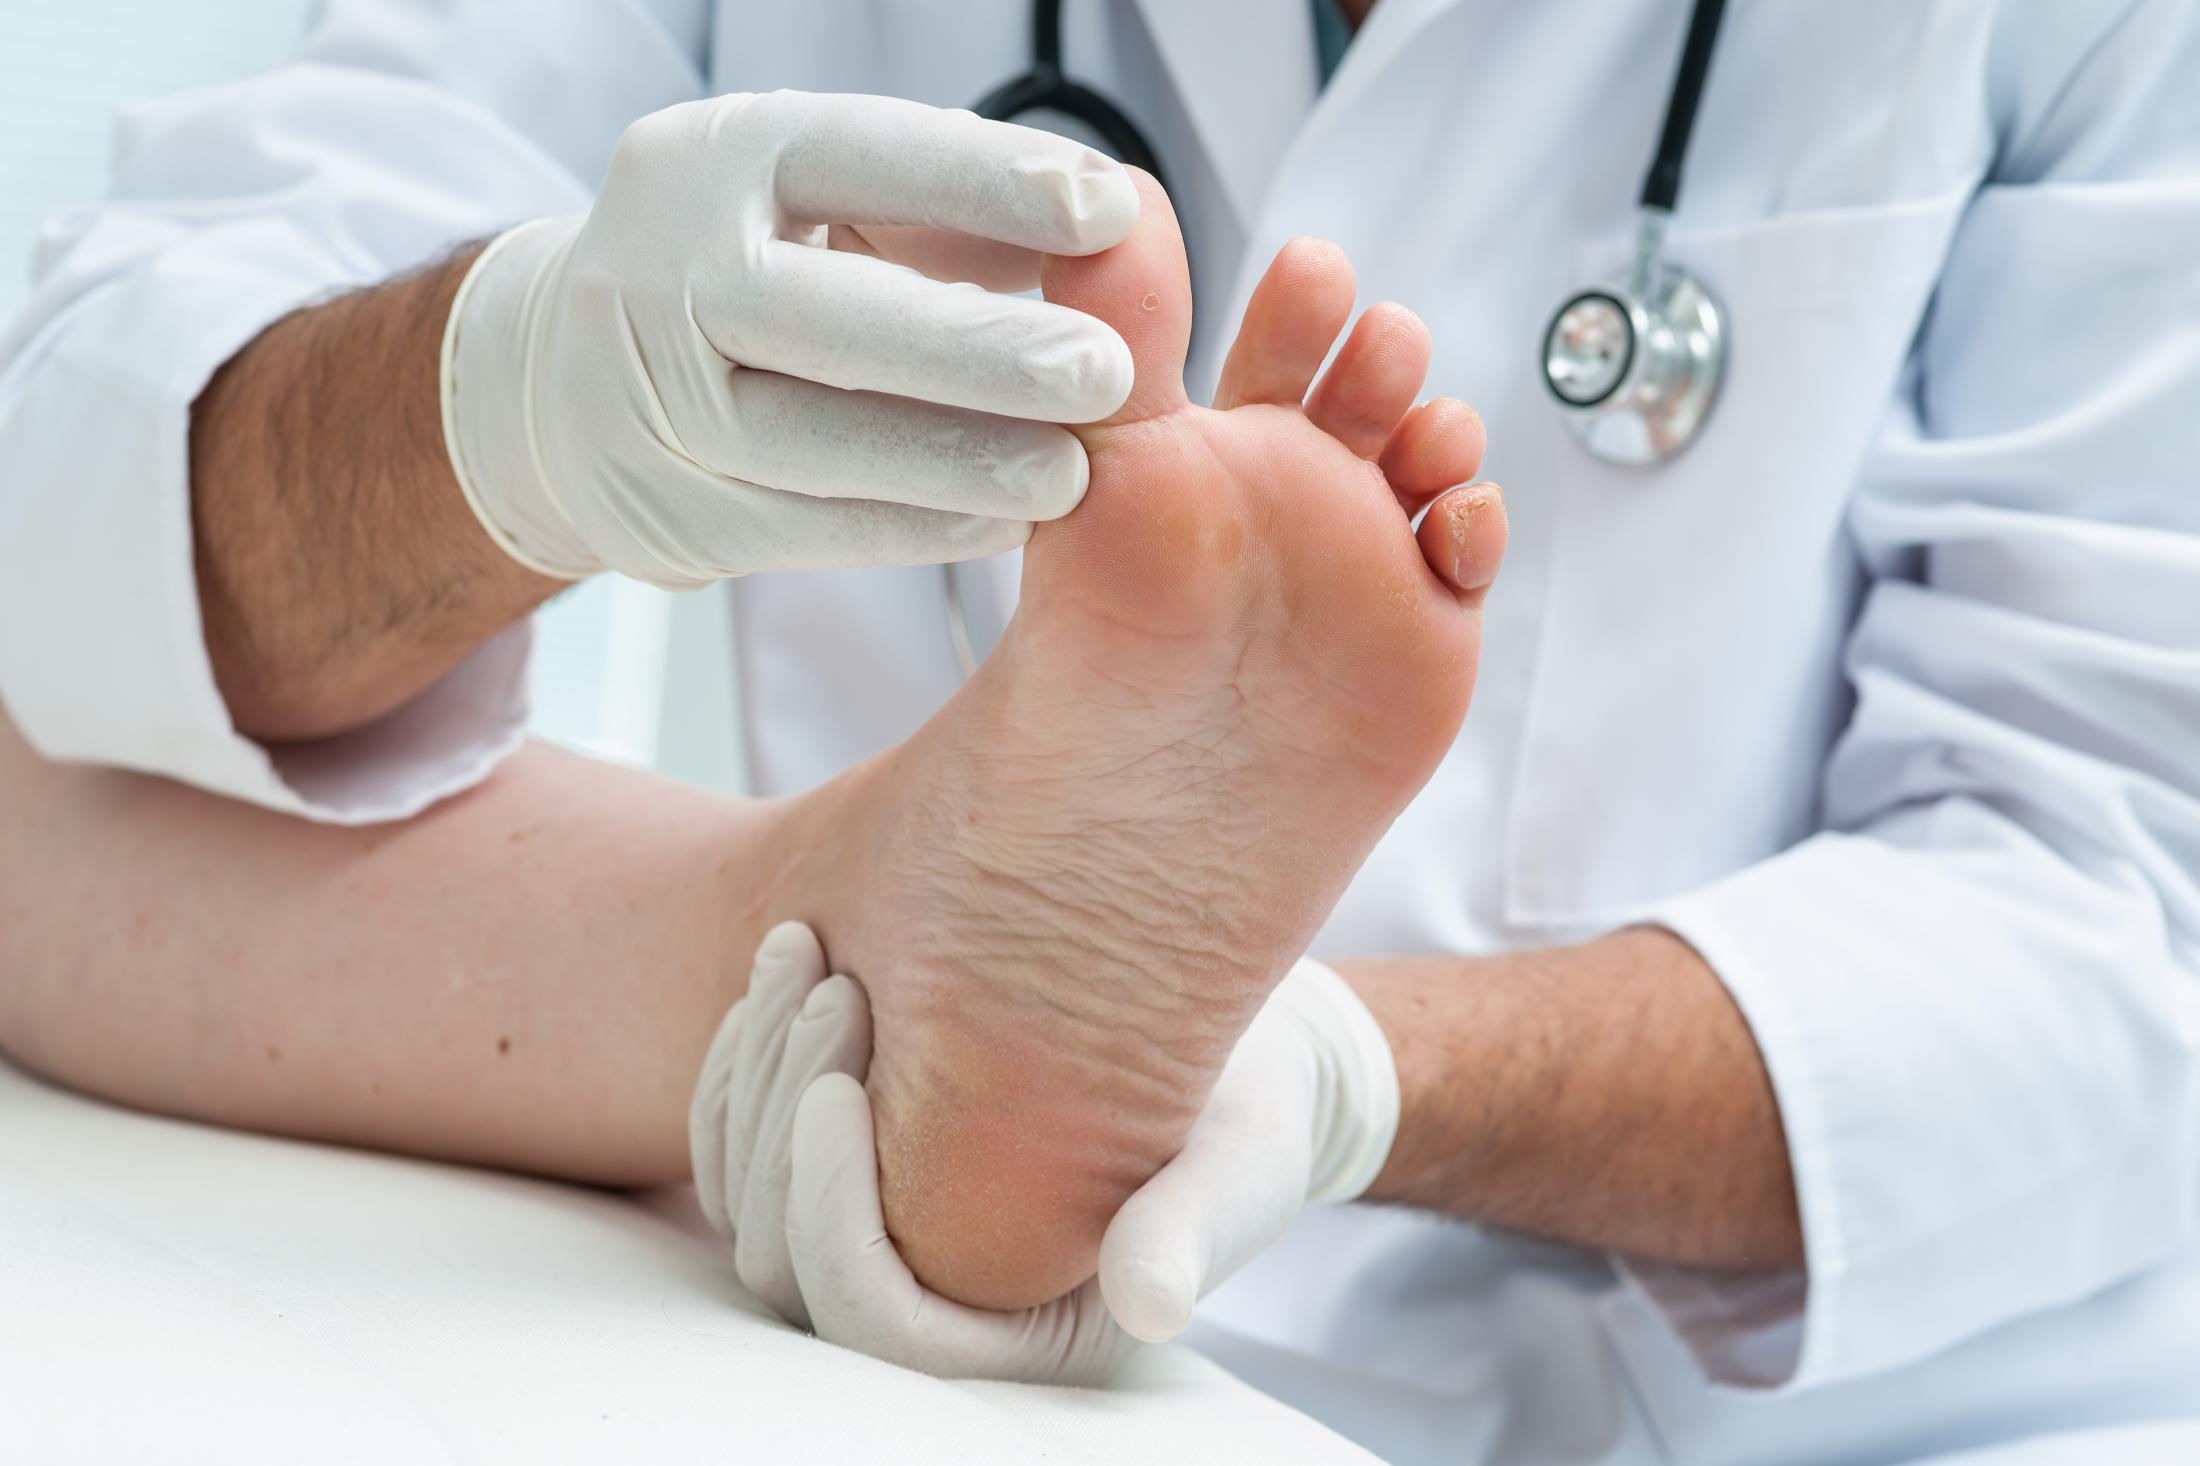 Preventing amputations